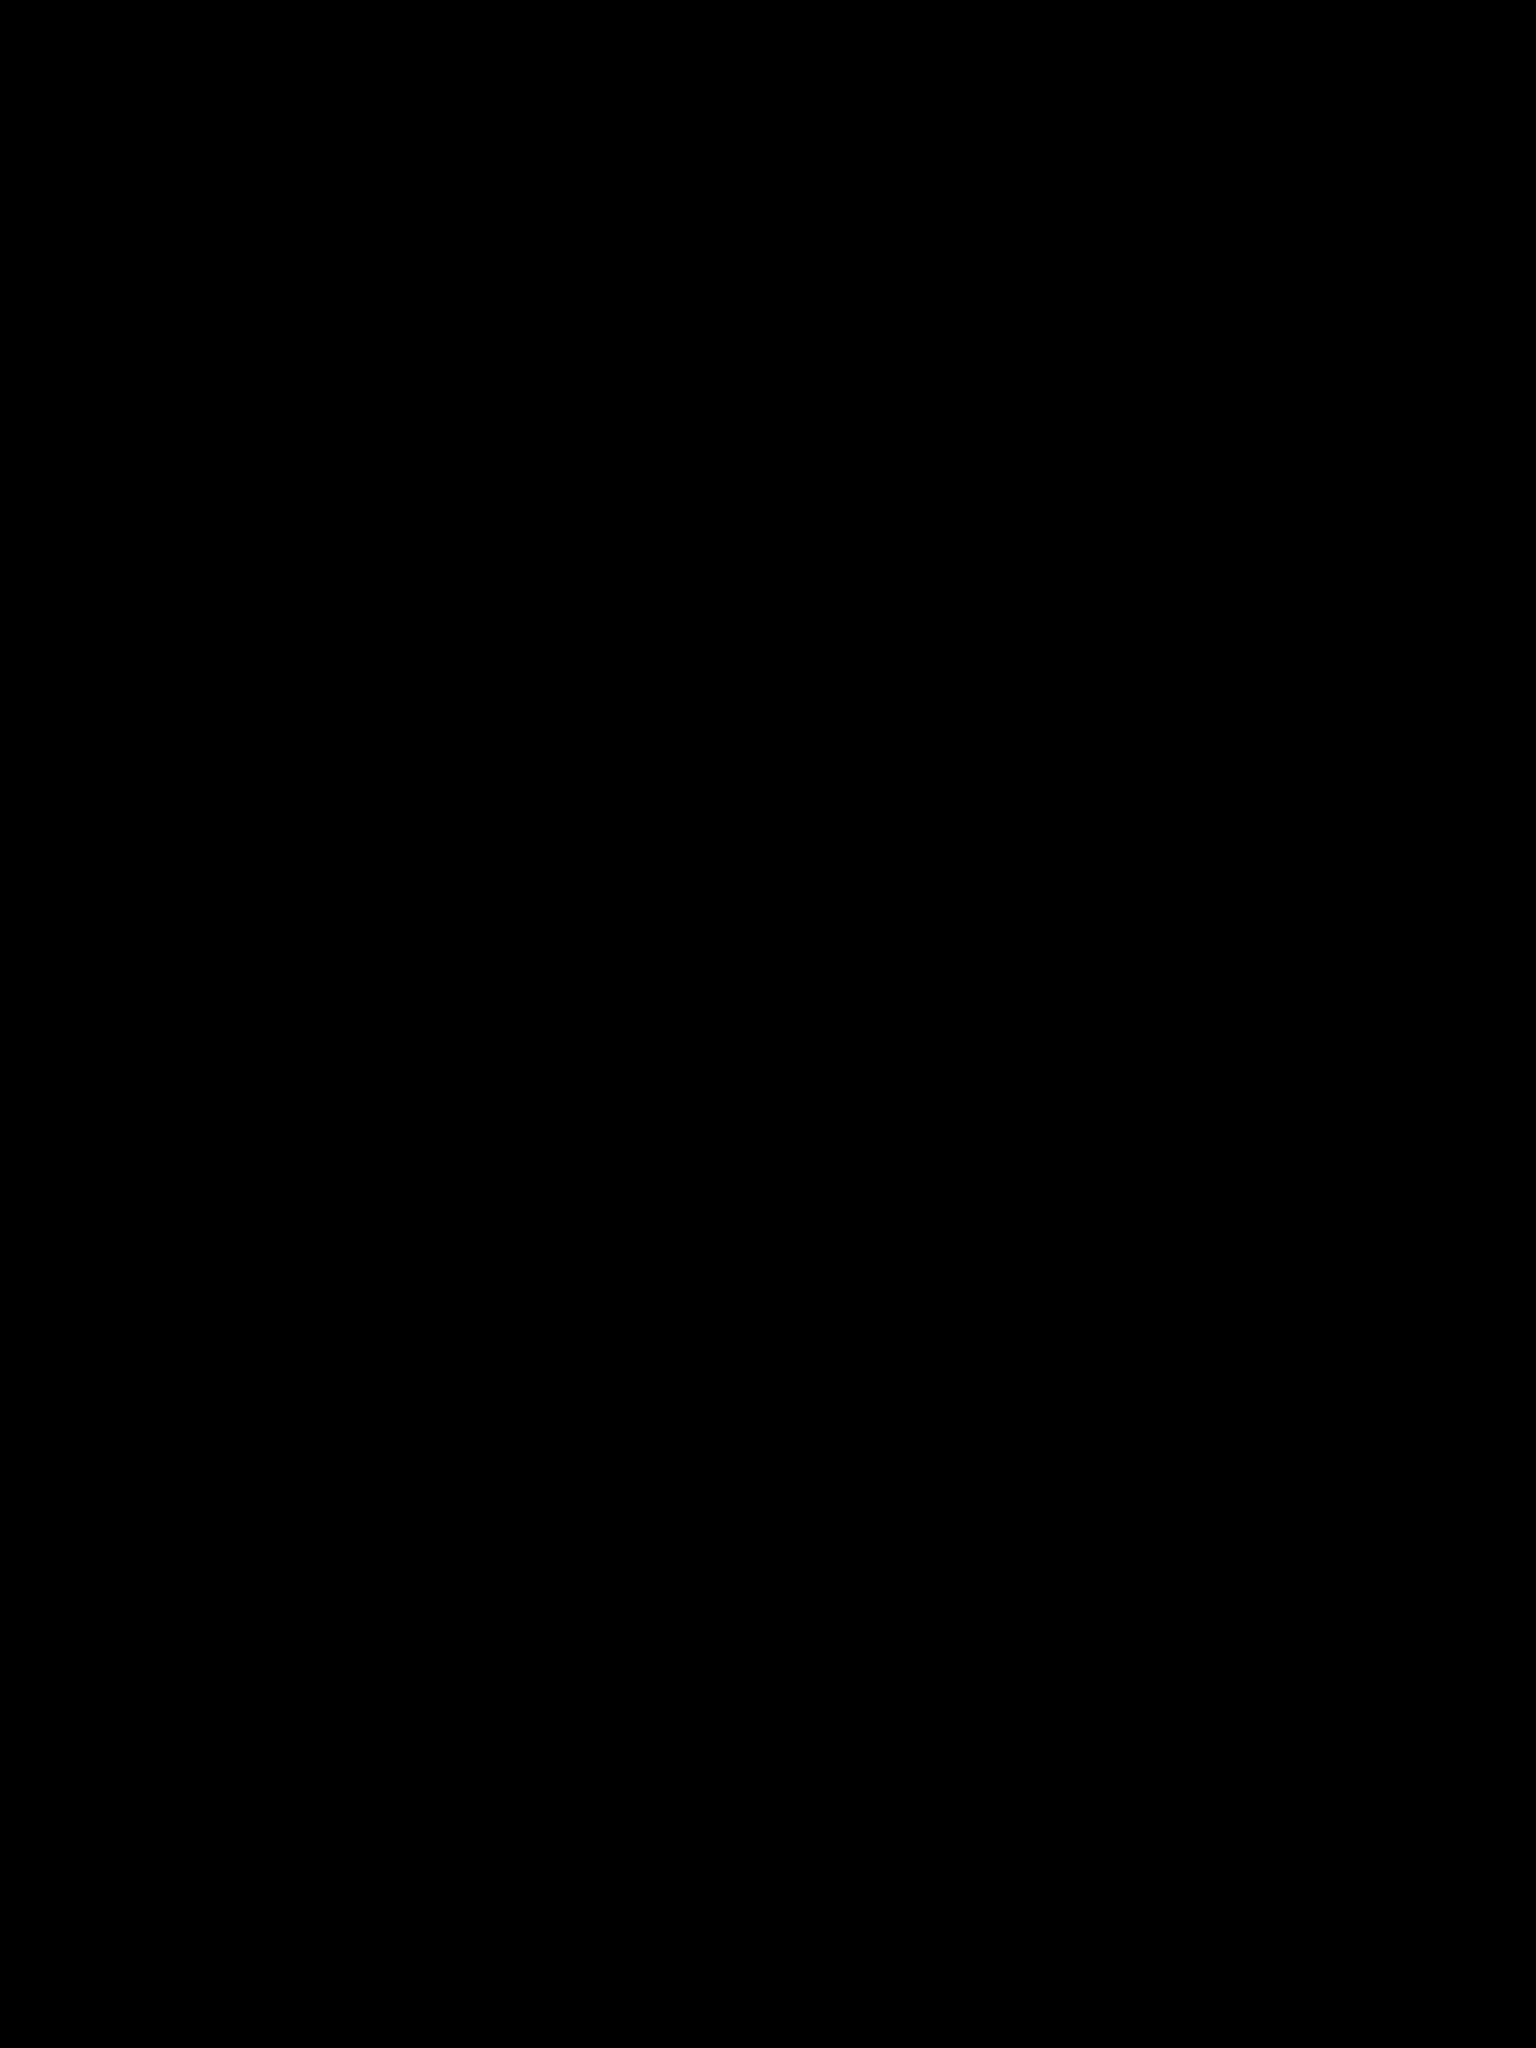 Brickell Halter Bralette